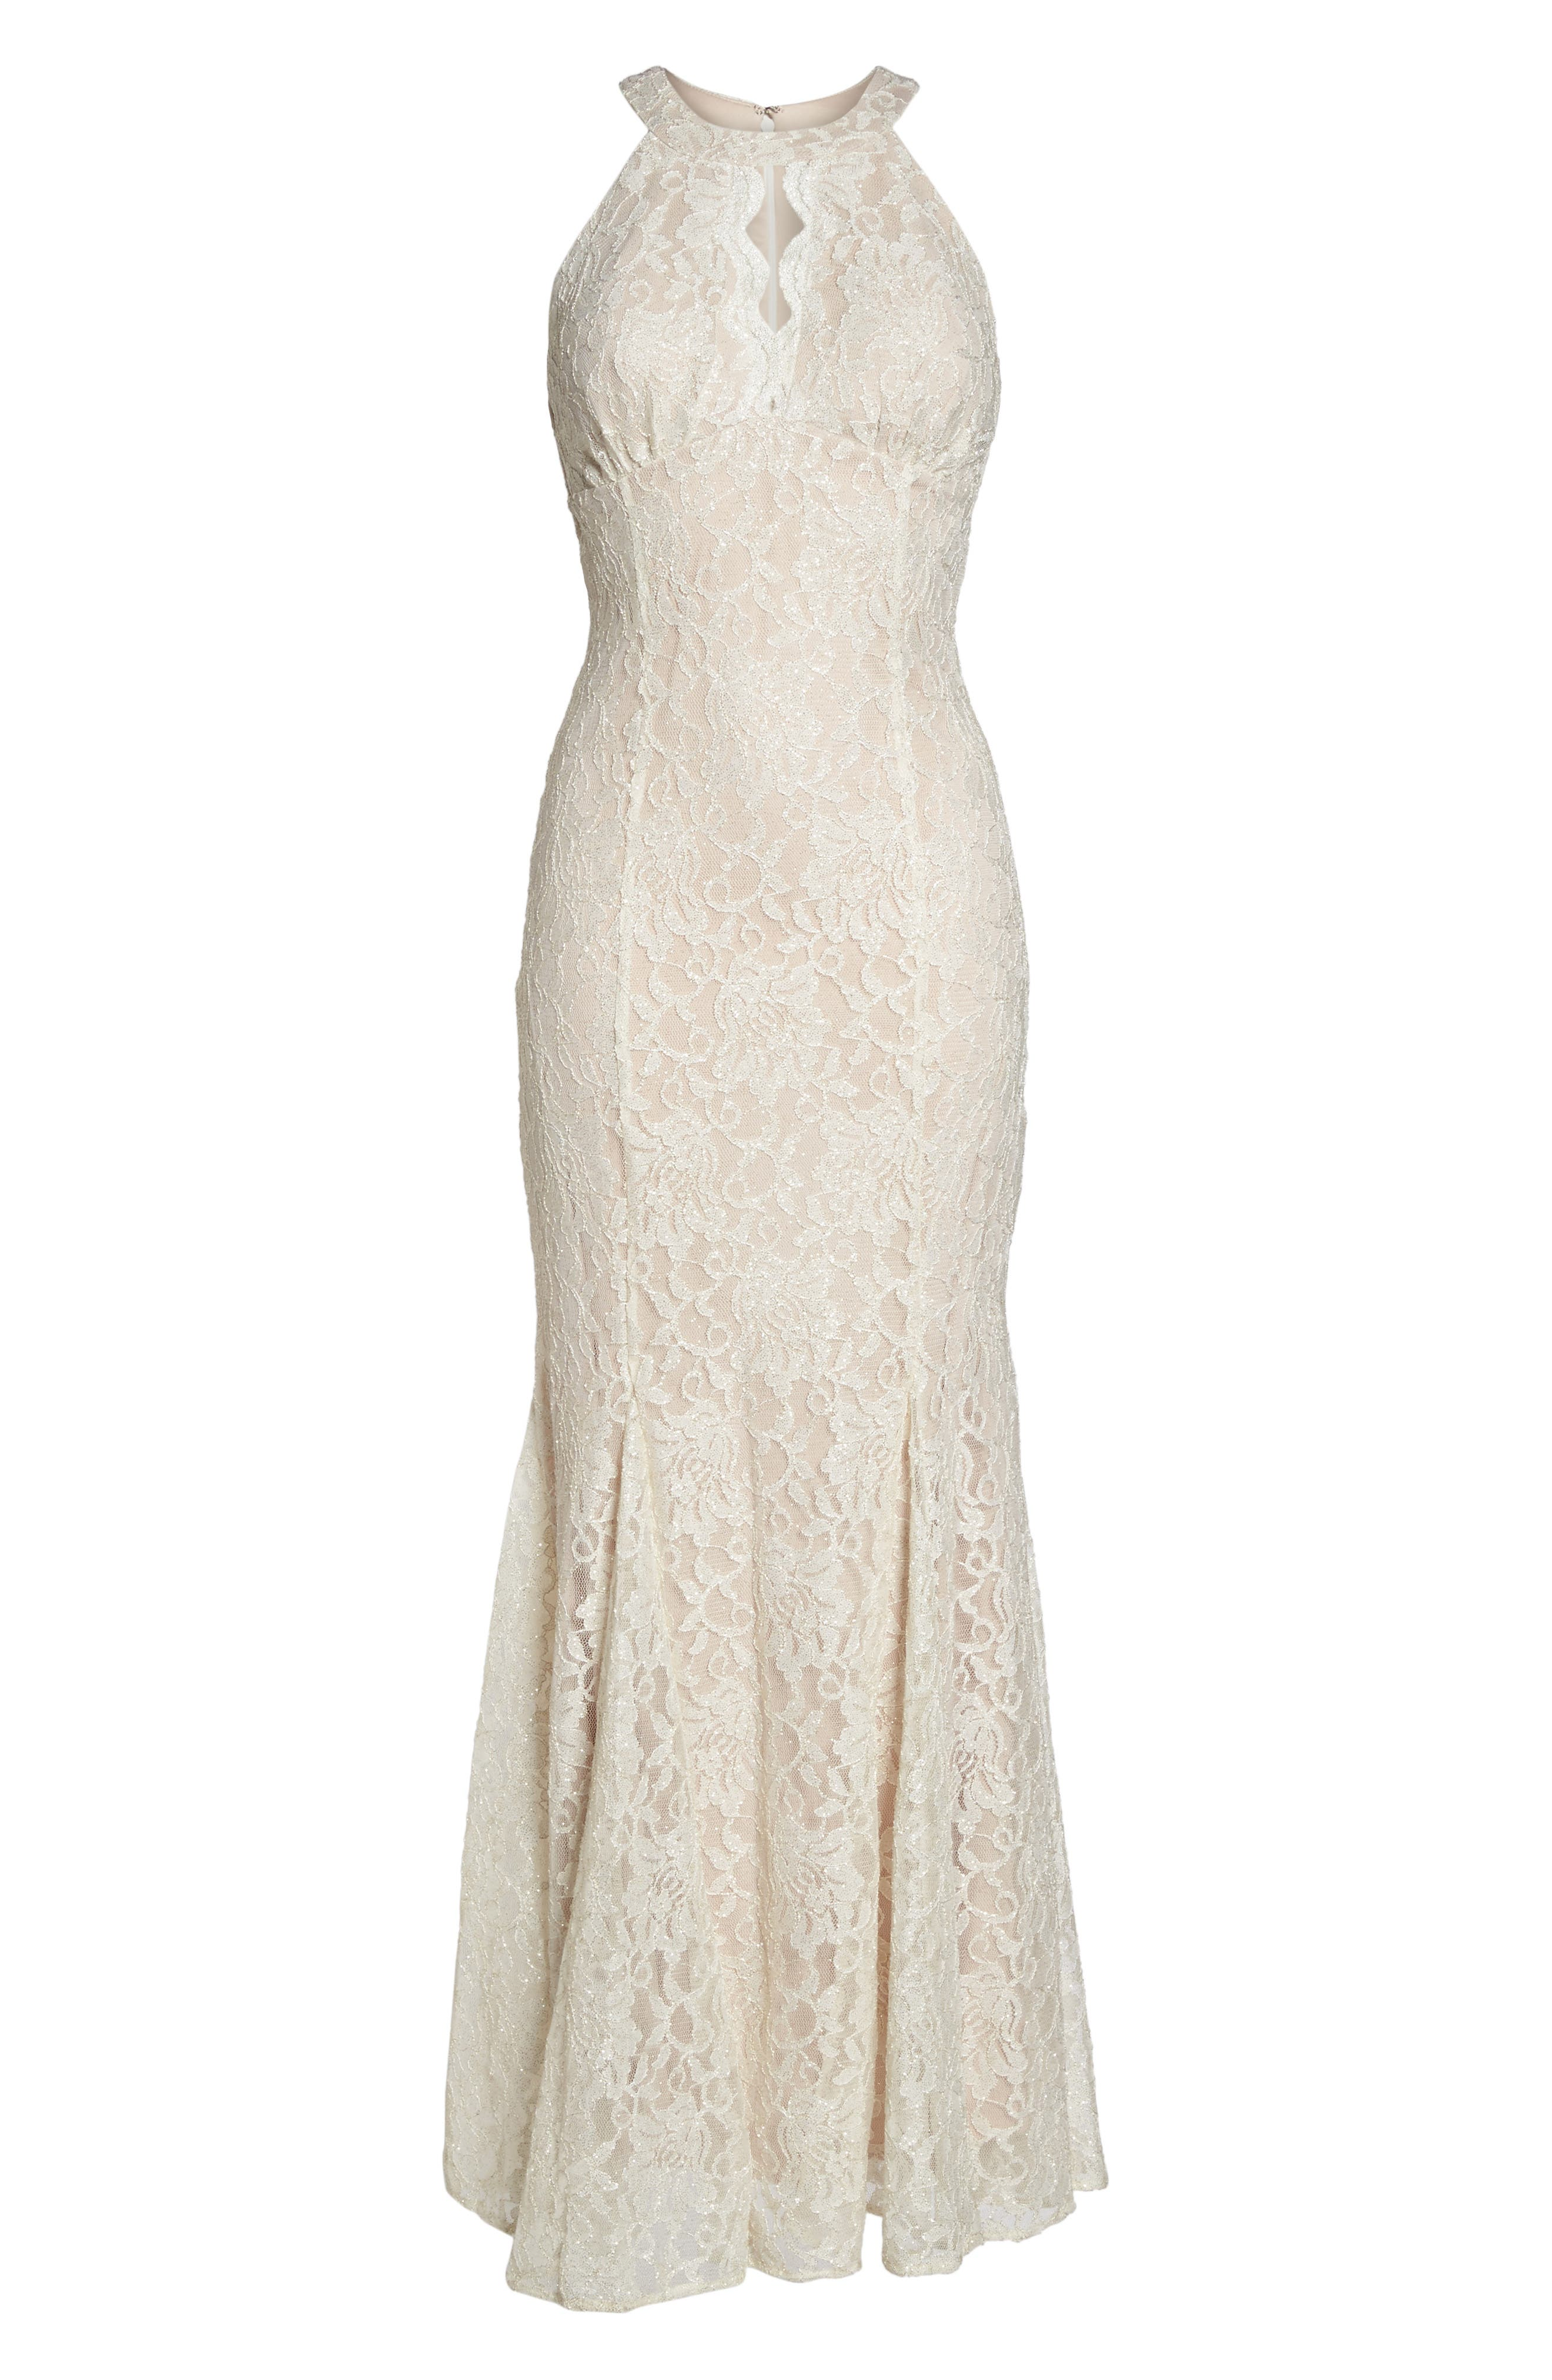 Scallop Detail Lace Gown,                             Alternate thumbnail 6, color,                             902